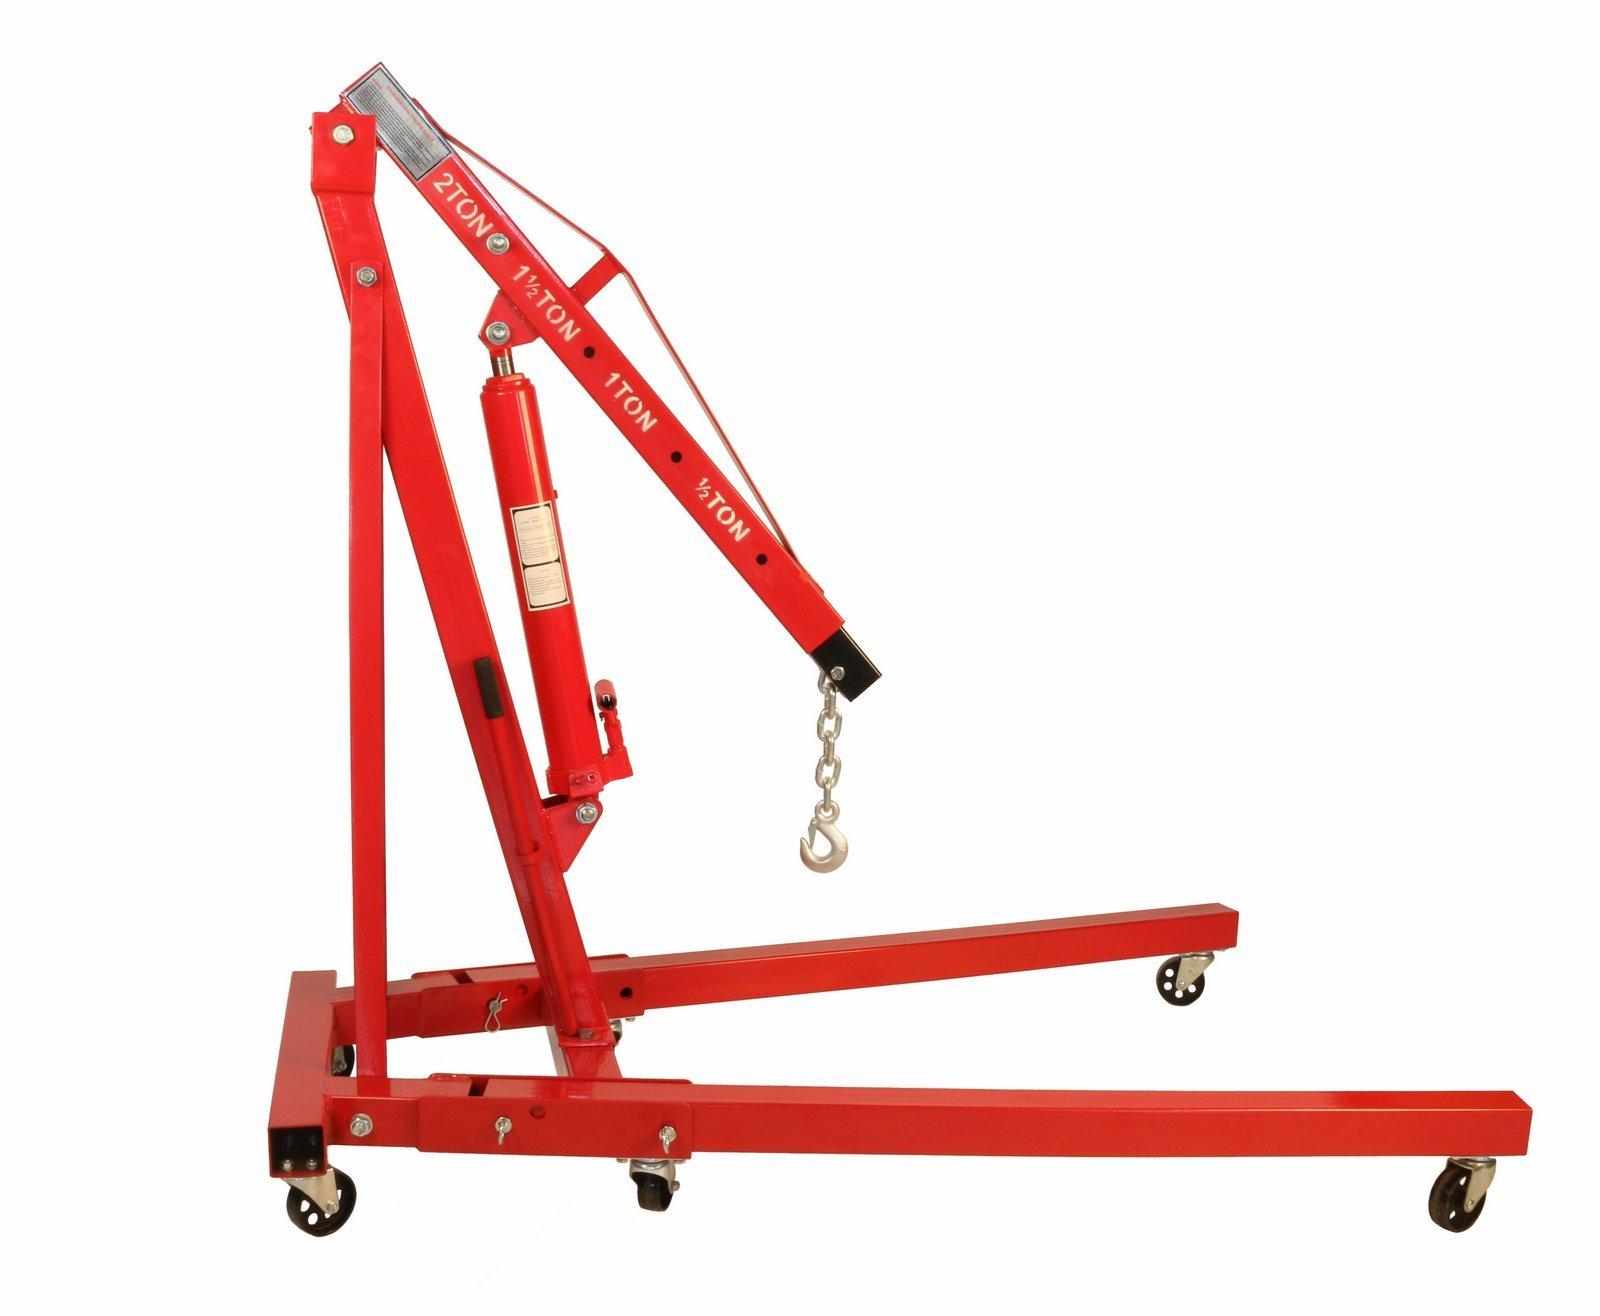 Dragway Tools 2 Ton Folding Hydraulic Engine Hoist Cherry Picker Shop Crane Hoist Lift by Dragway Tools (Image #6)